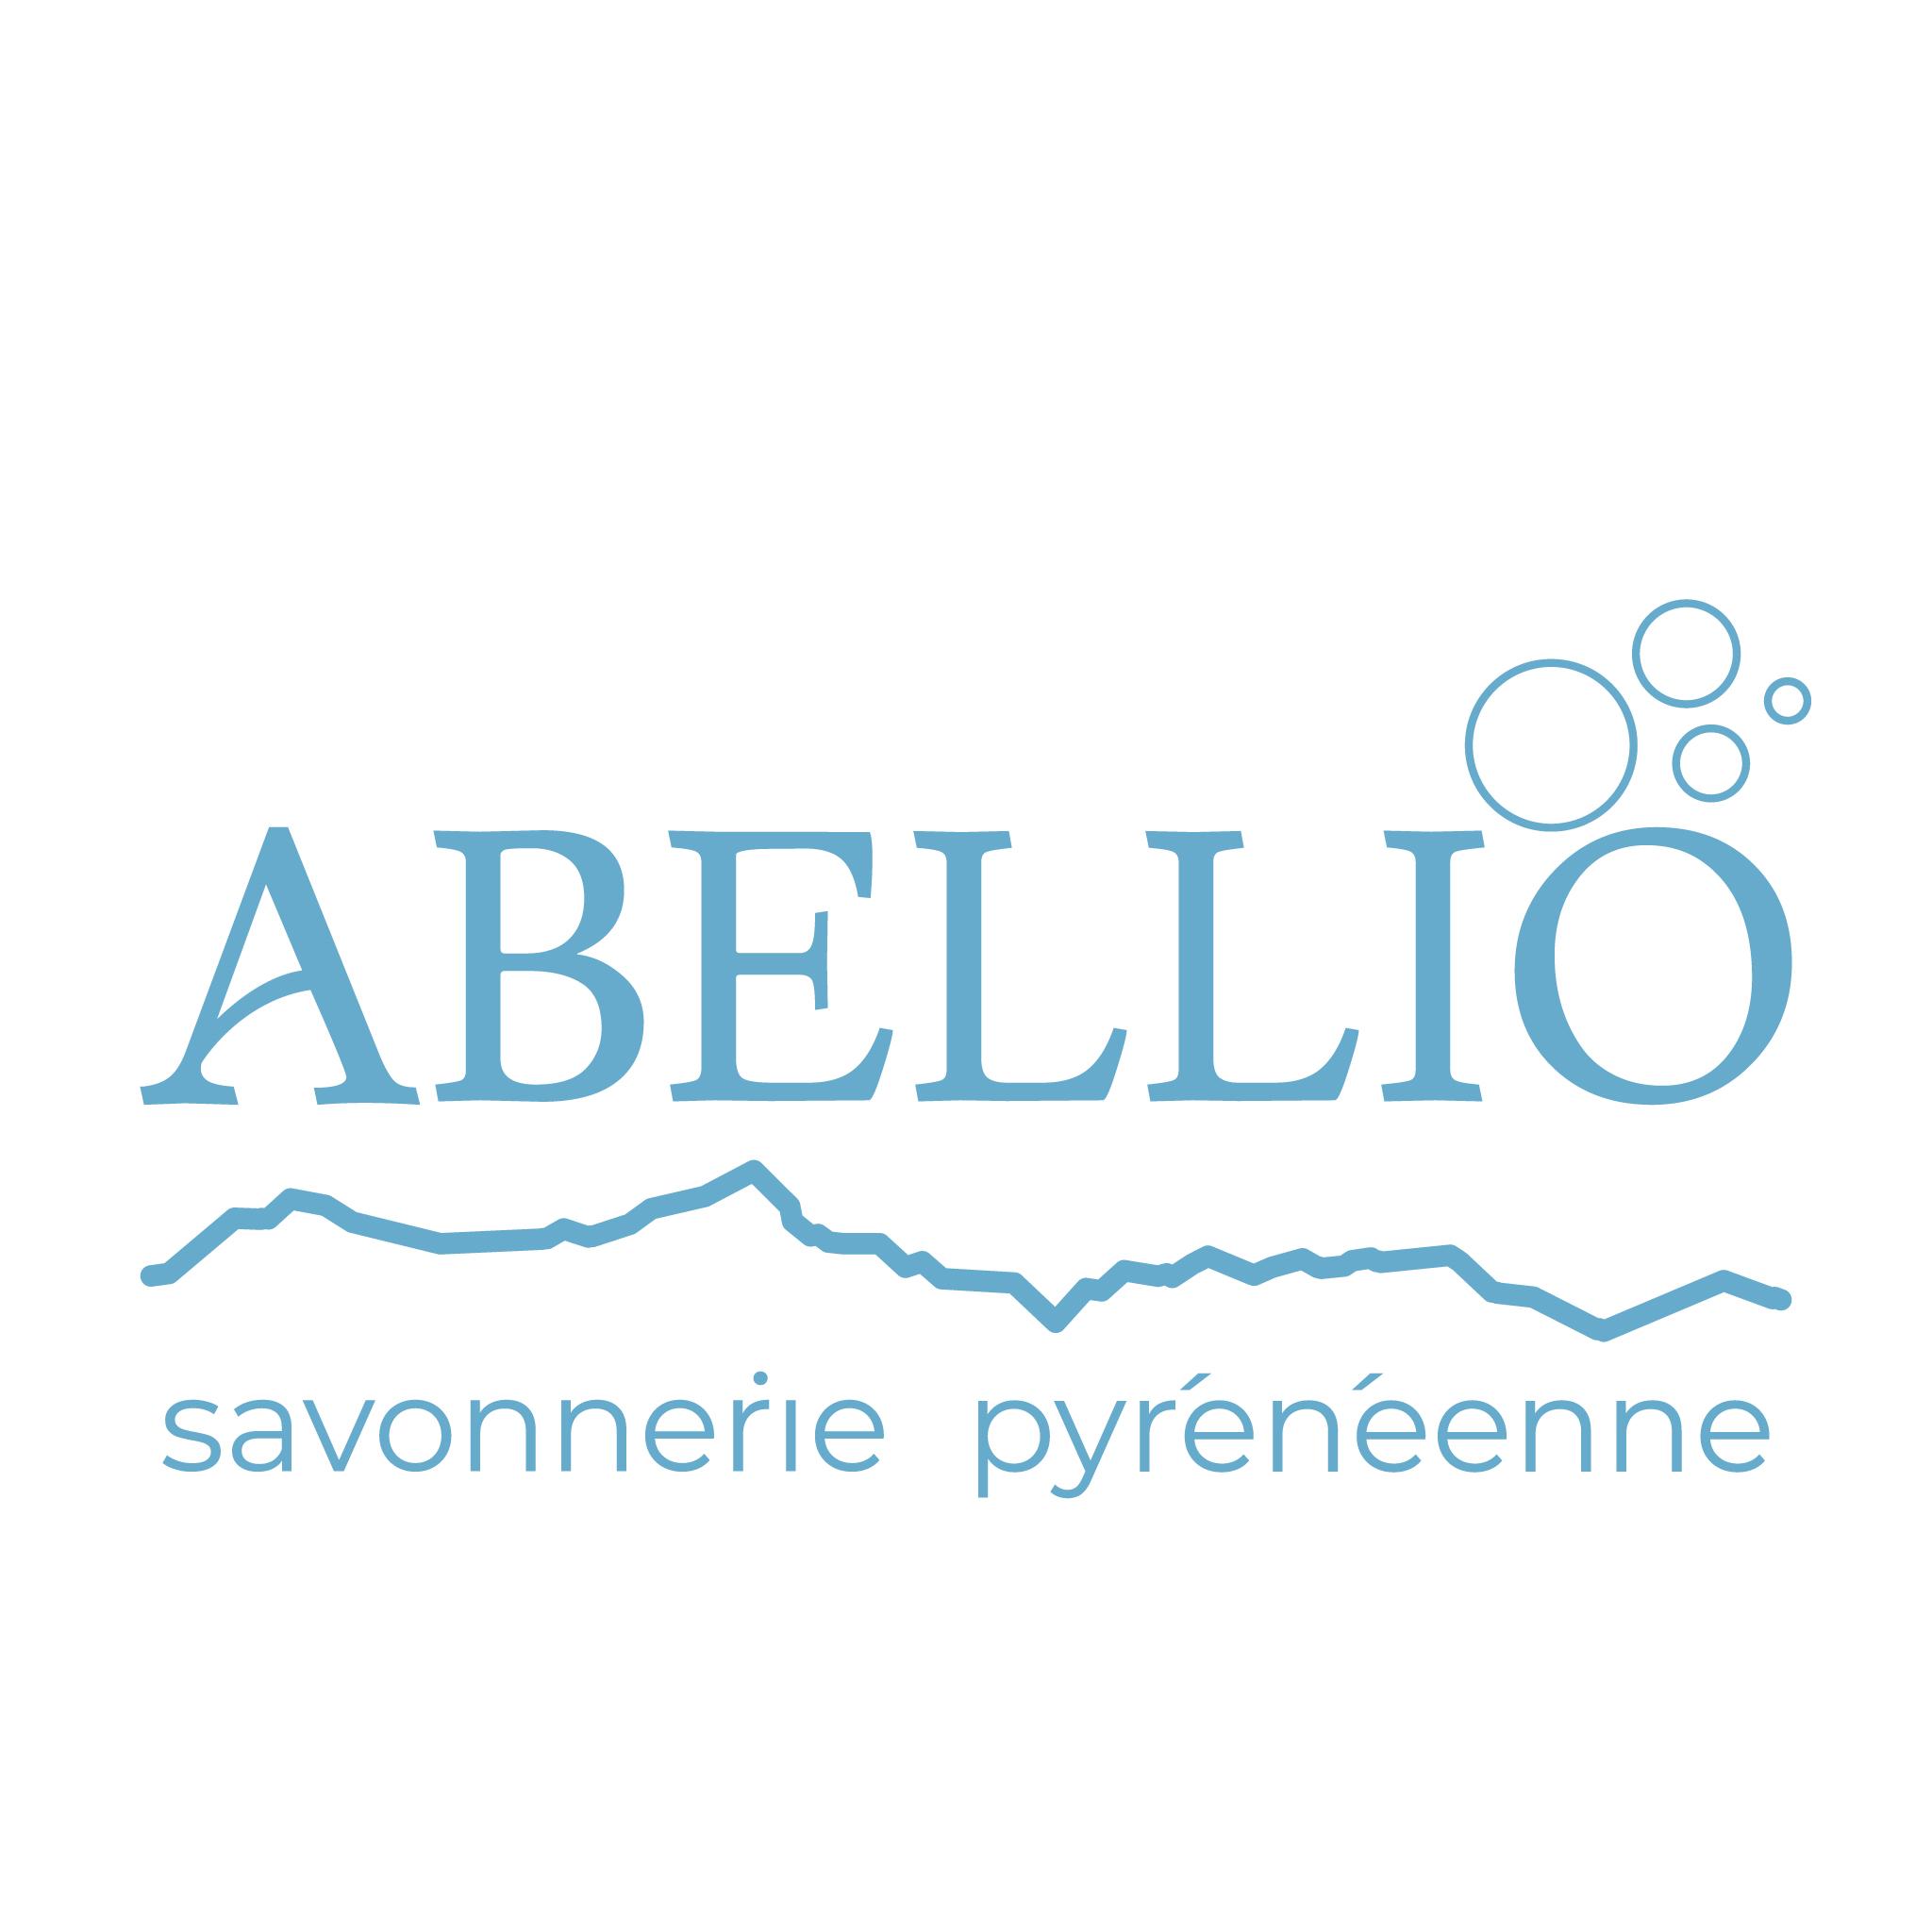 Abellio Savonnerie **